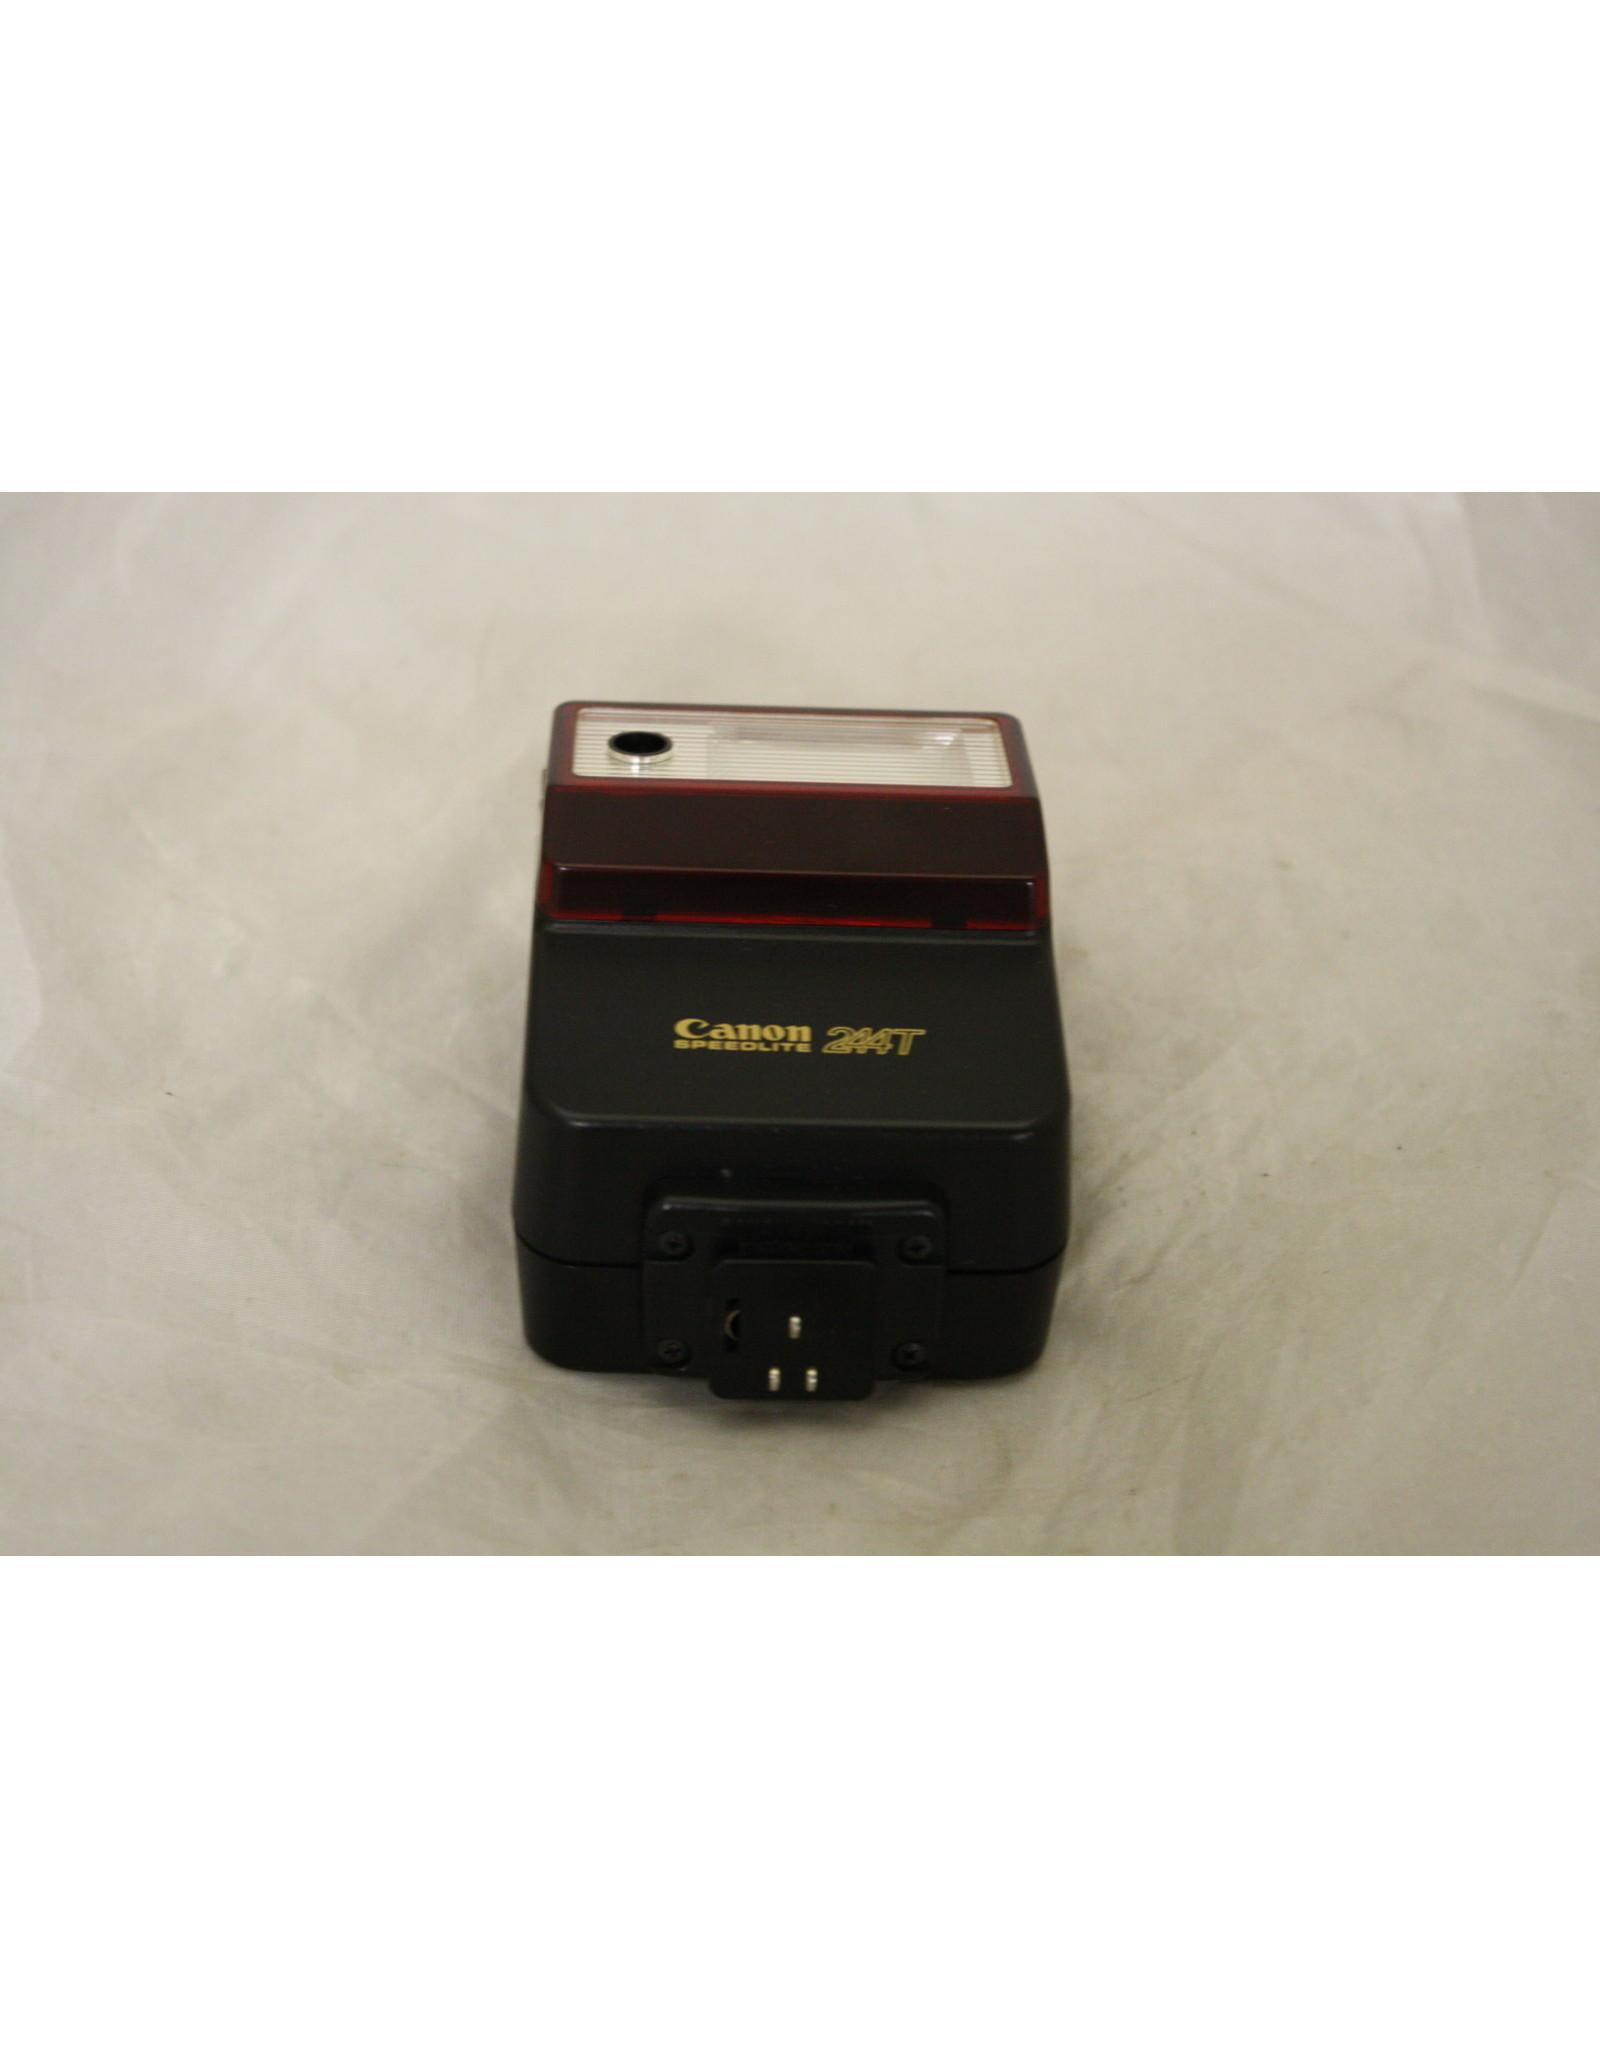 Canon Speedlite 244T In Box